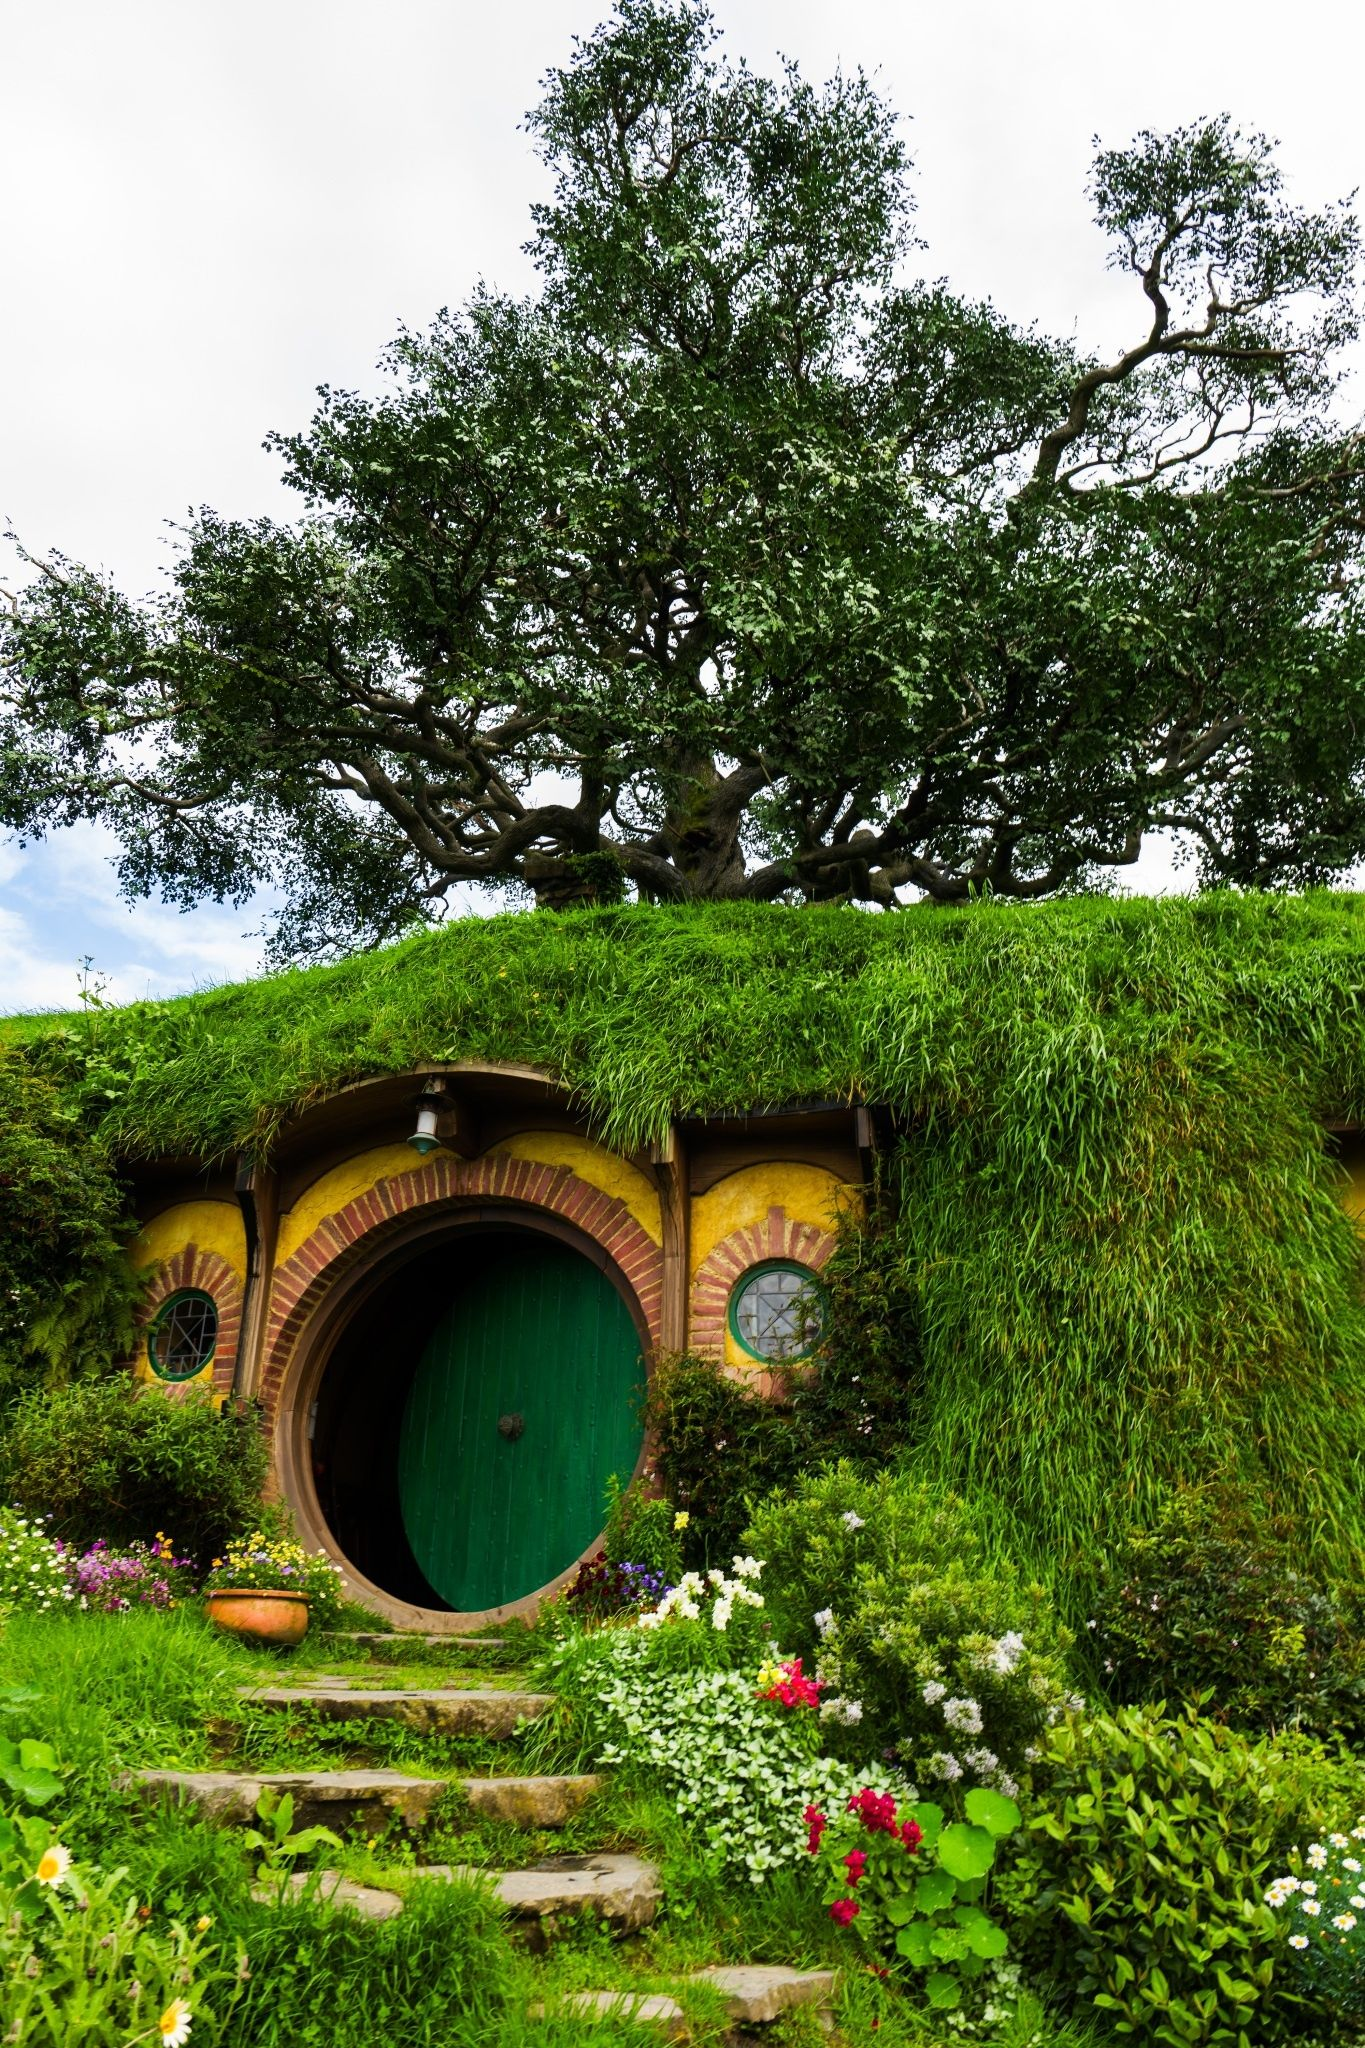 Outdoors New Zealand Hobbit House